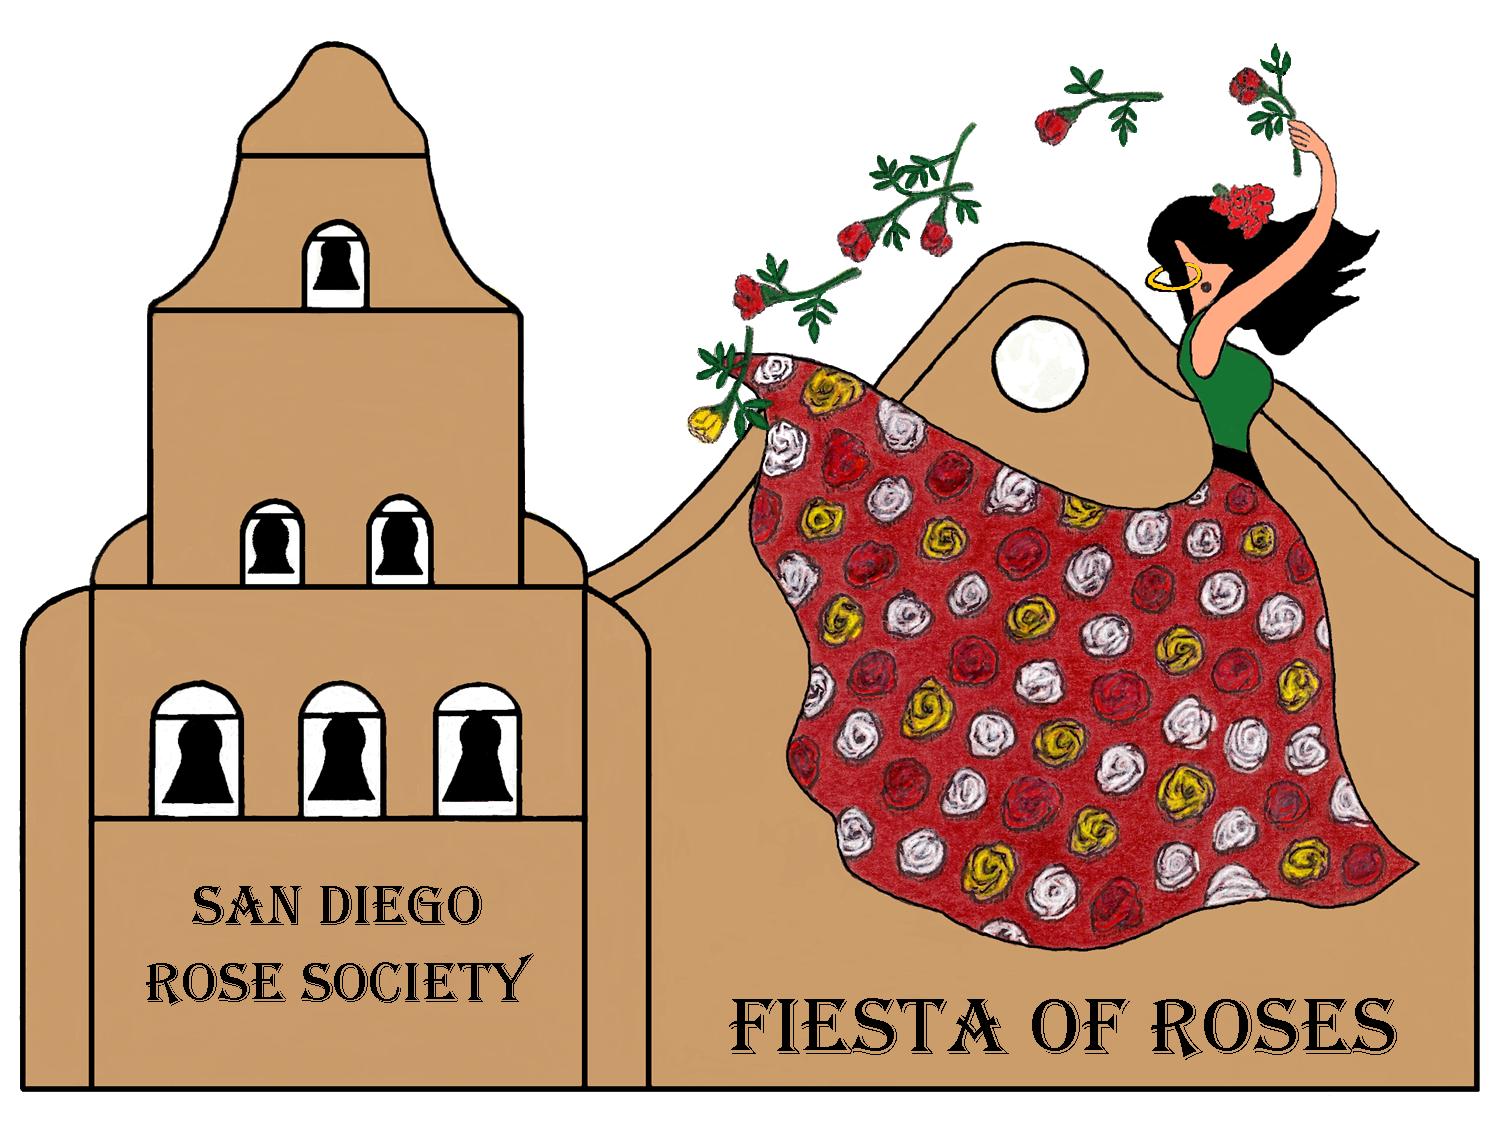 Dinner clipart dinner meeting. Fiesta of roses october